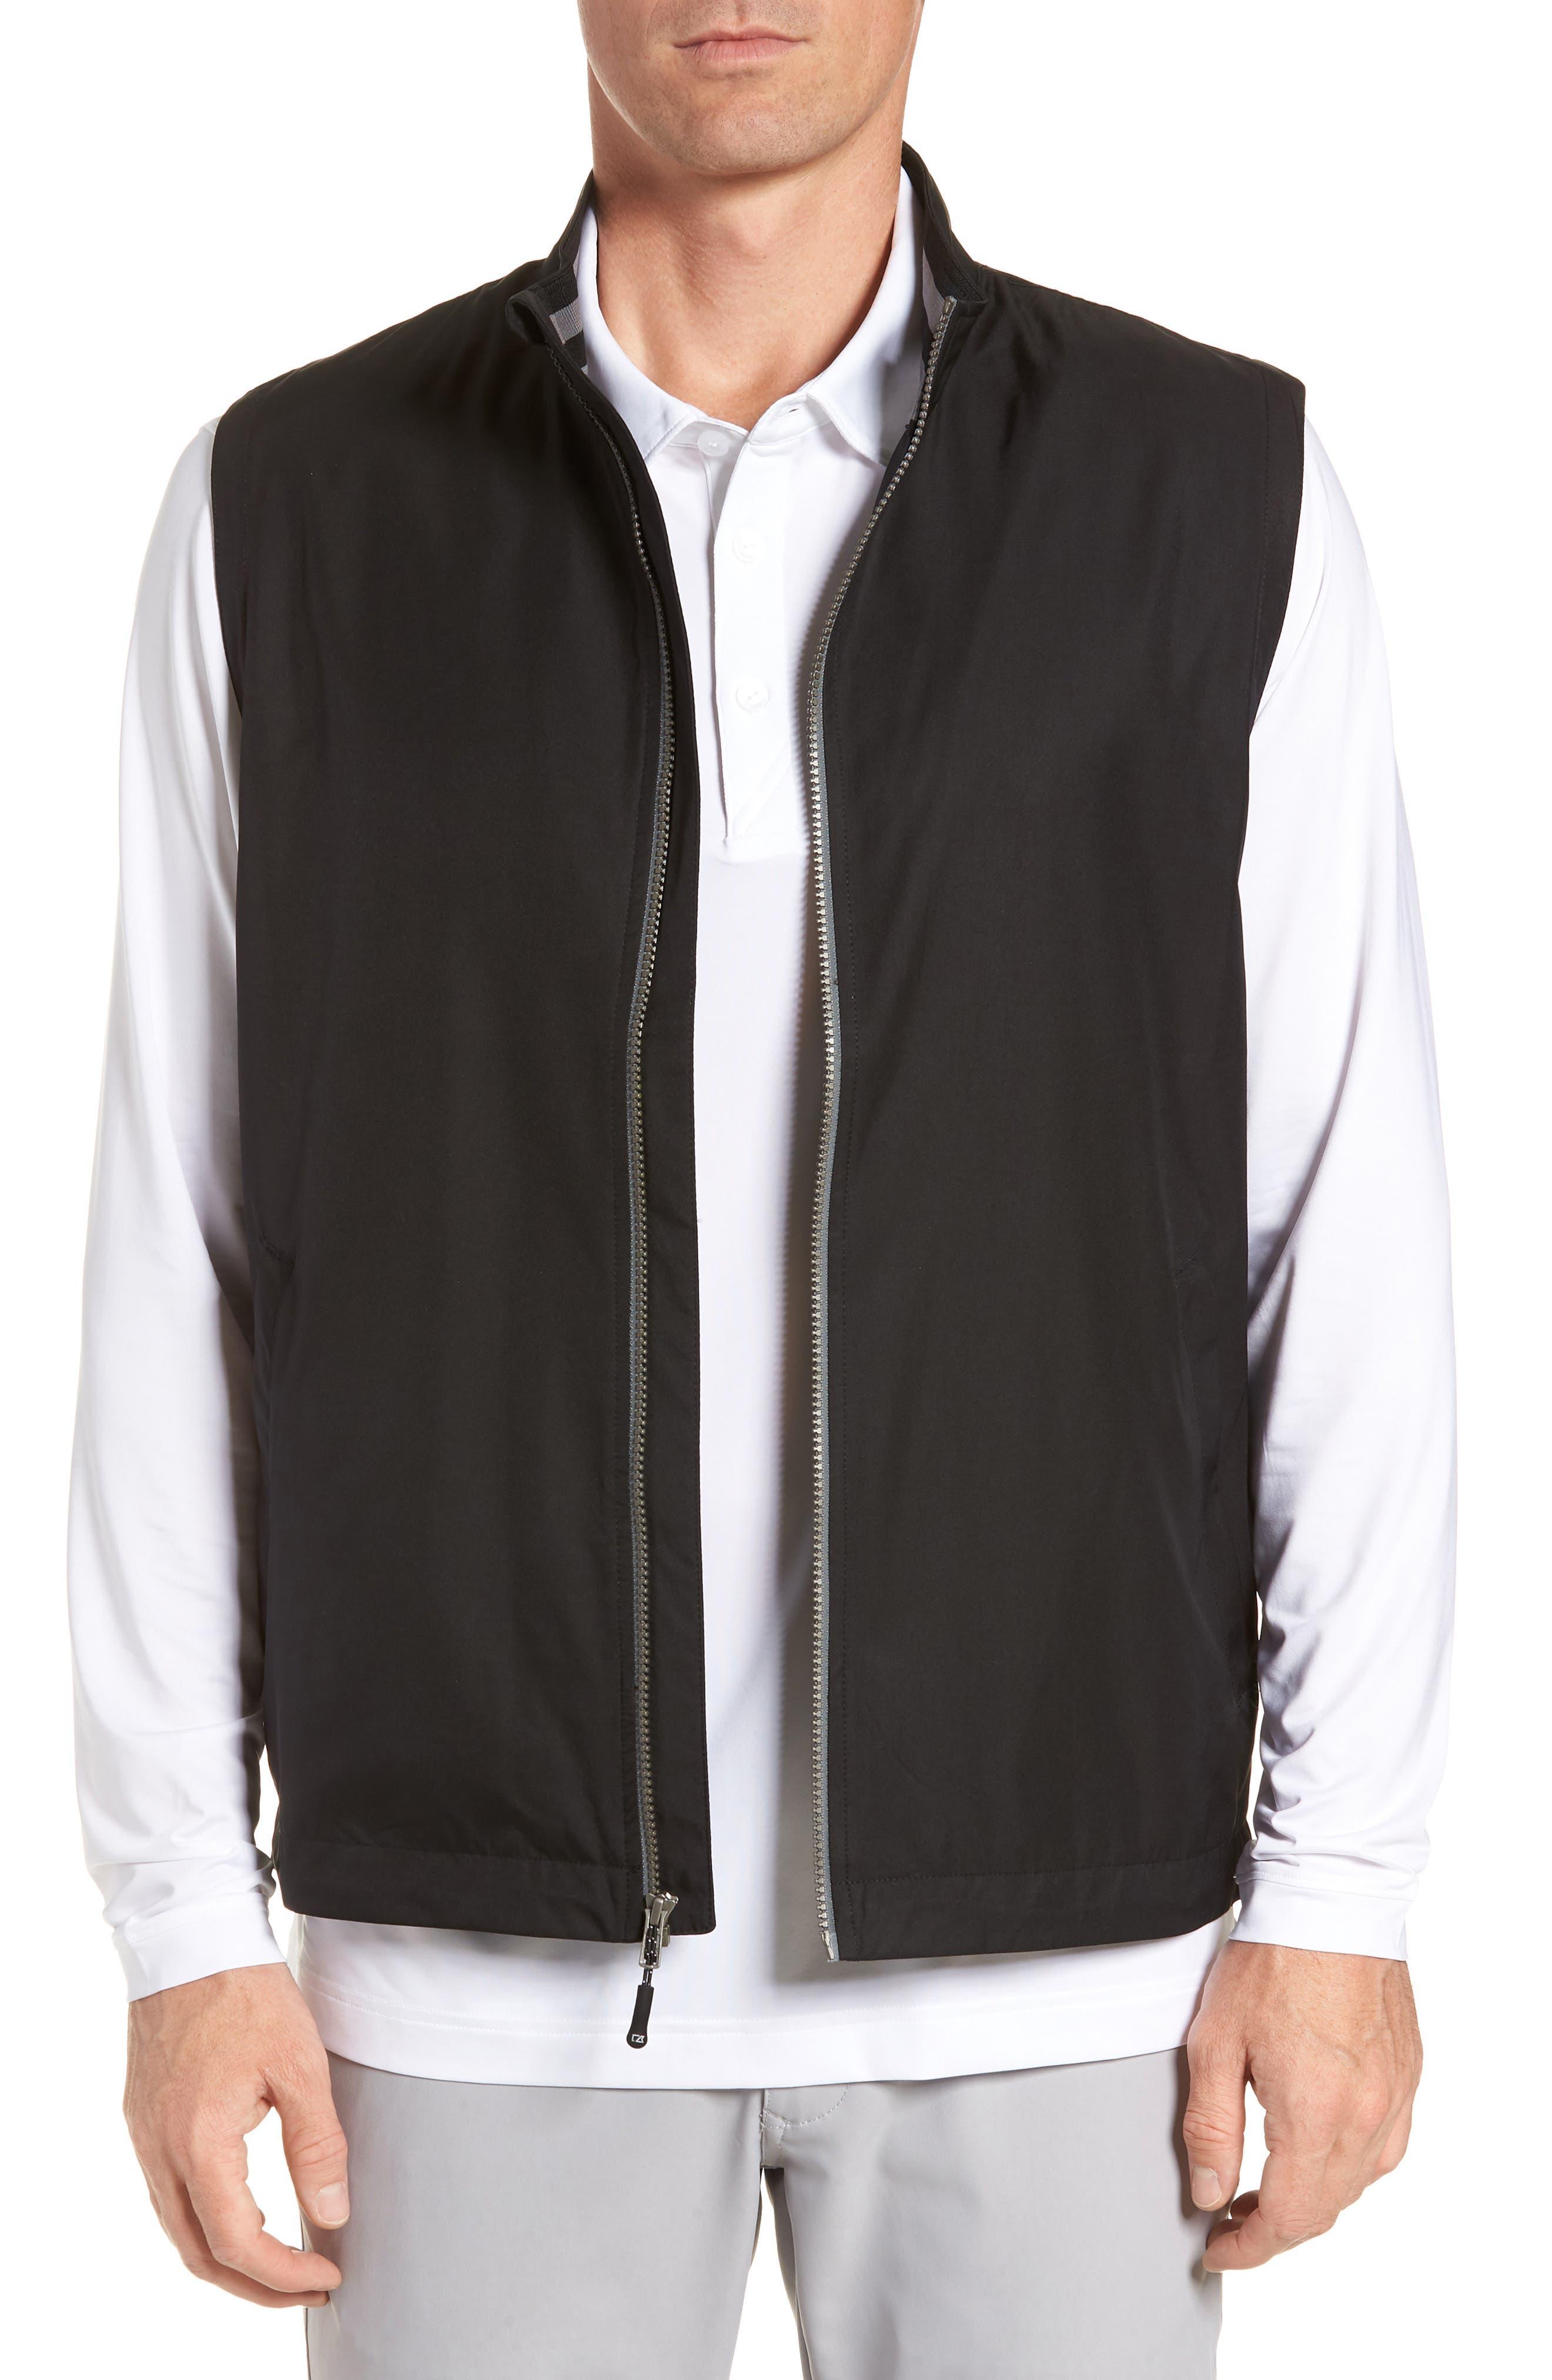 Cutter & Buck Nine Iron Drytec Zip Vest, Black